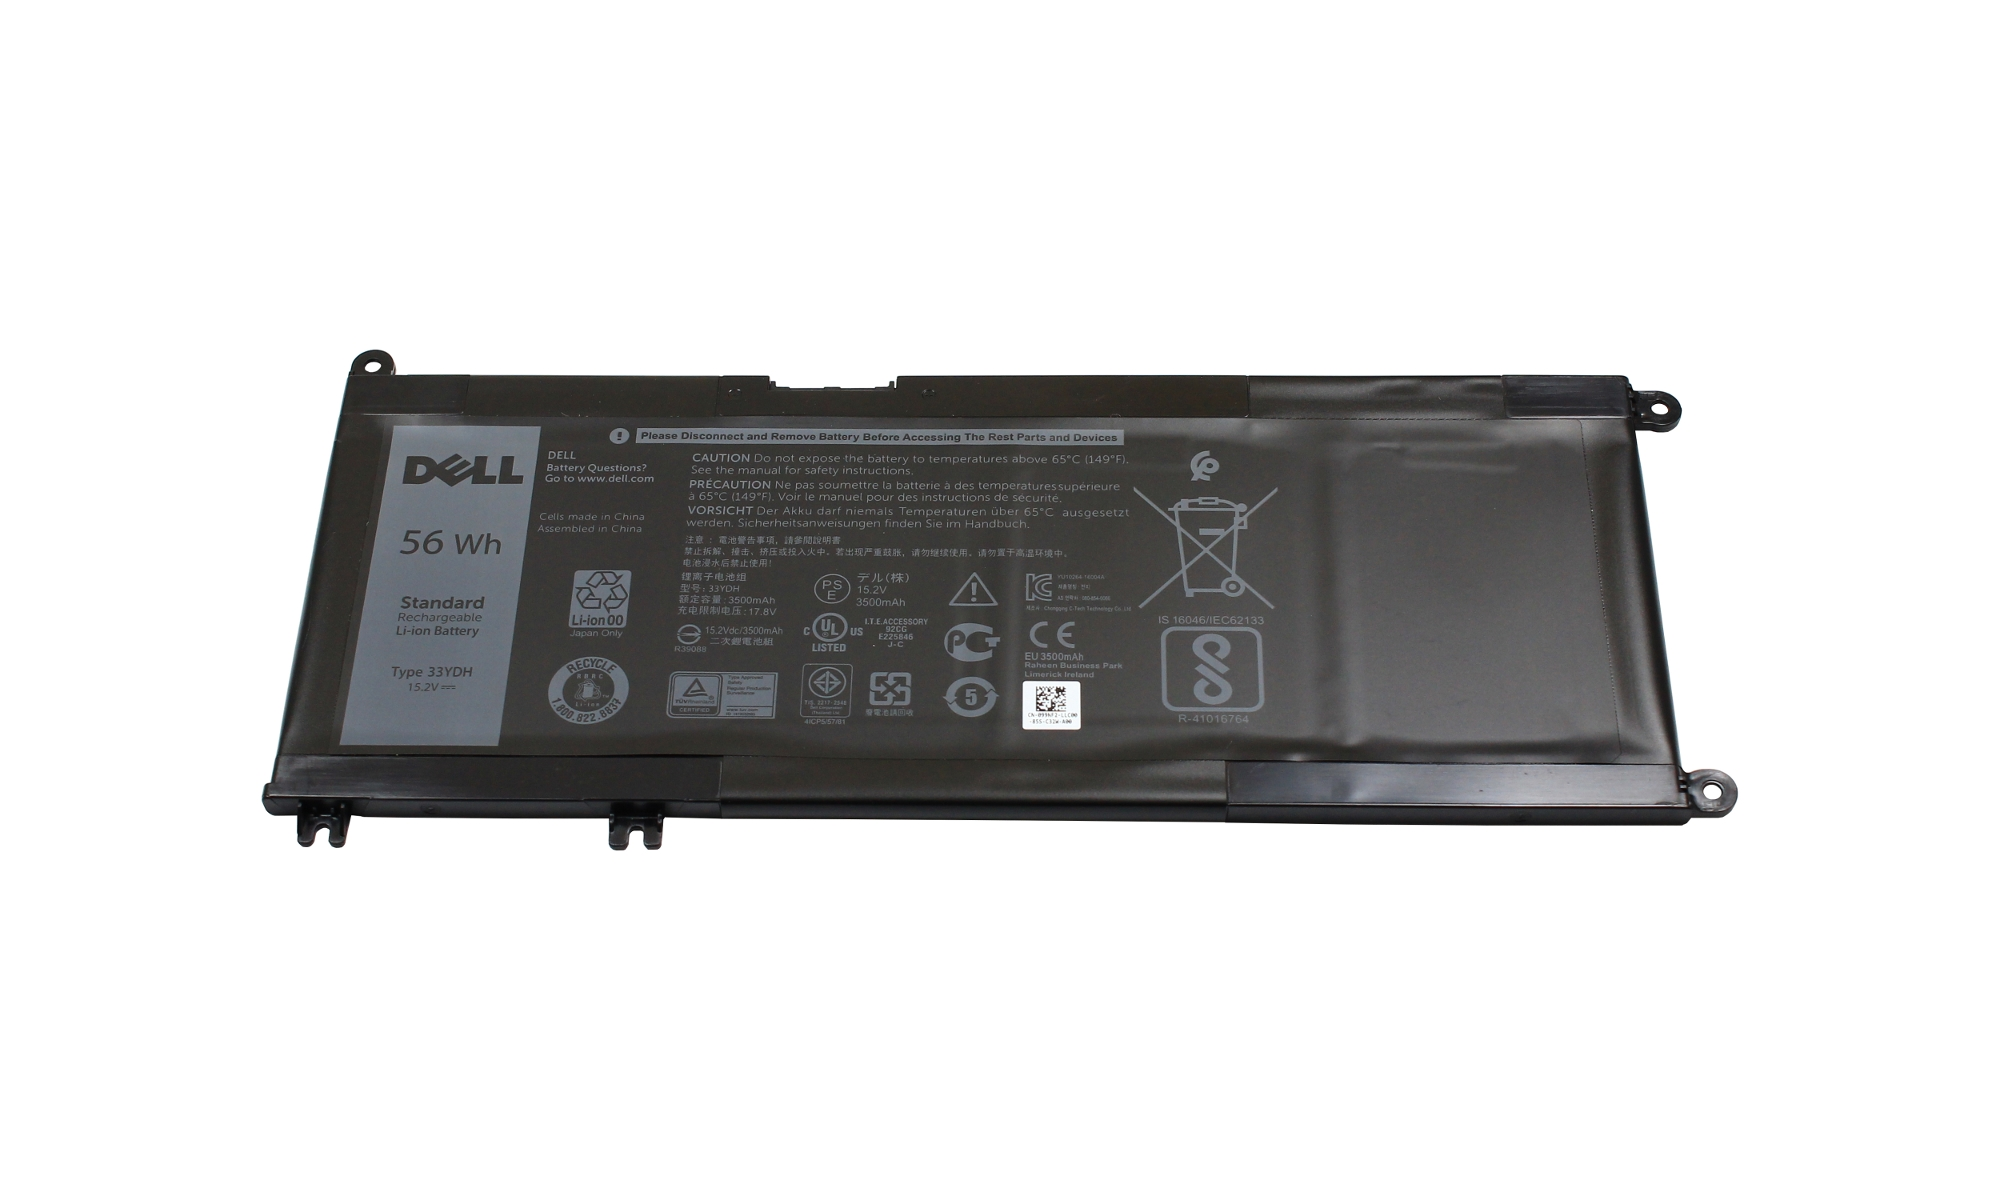 Baterie originala Dell Inspiron G3 3779, 56Wh 4 celule